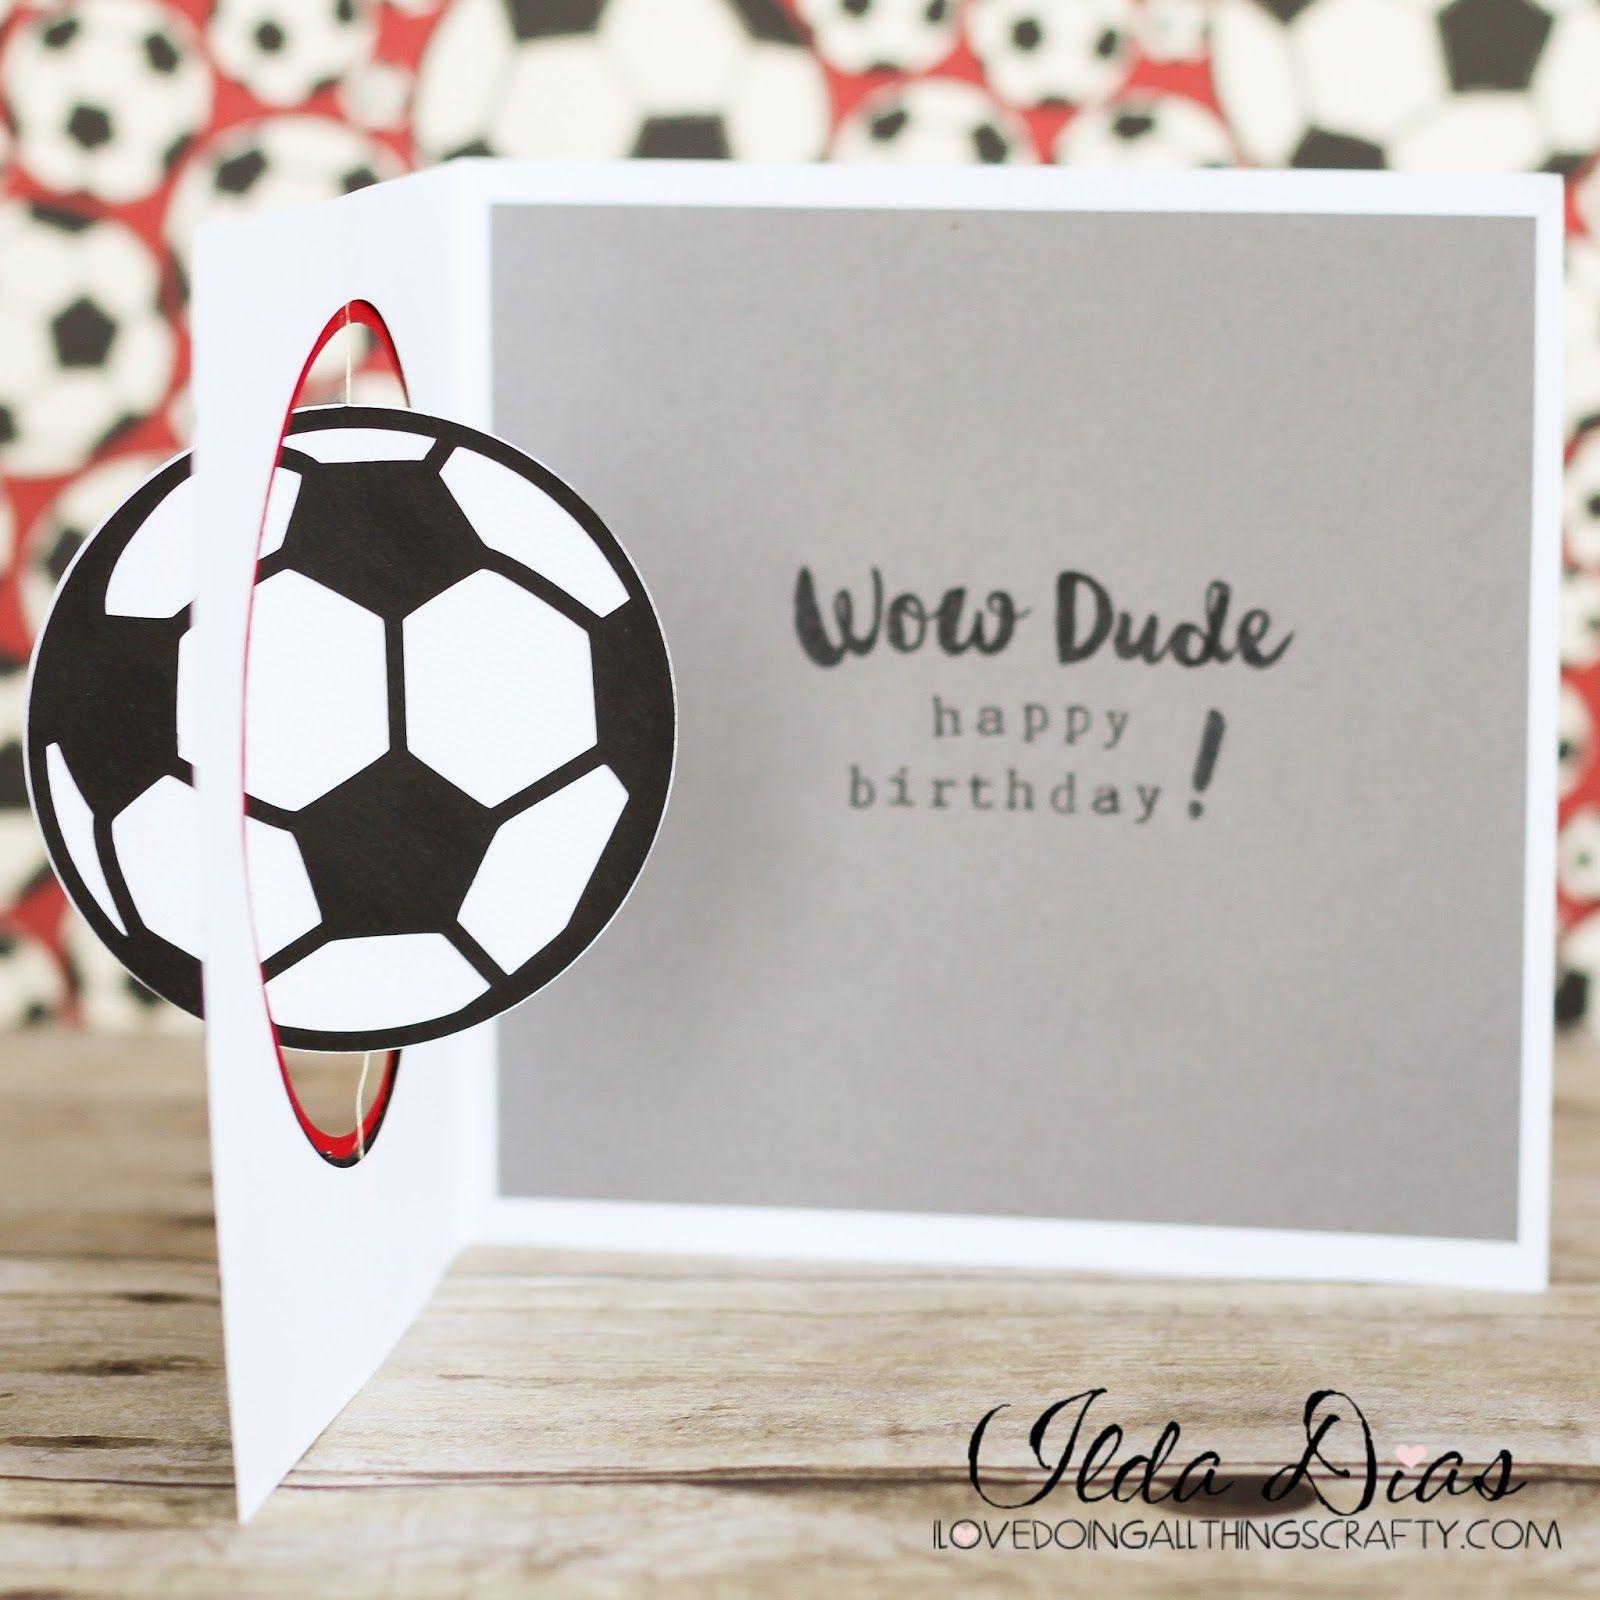 Soccer Ball Spinner Card Diy Birthday Card For Boyfriend Birthday Cards For Boyfriend Spinner Card